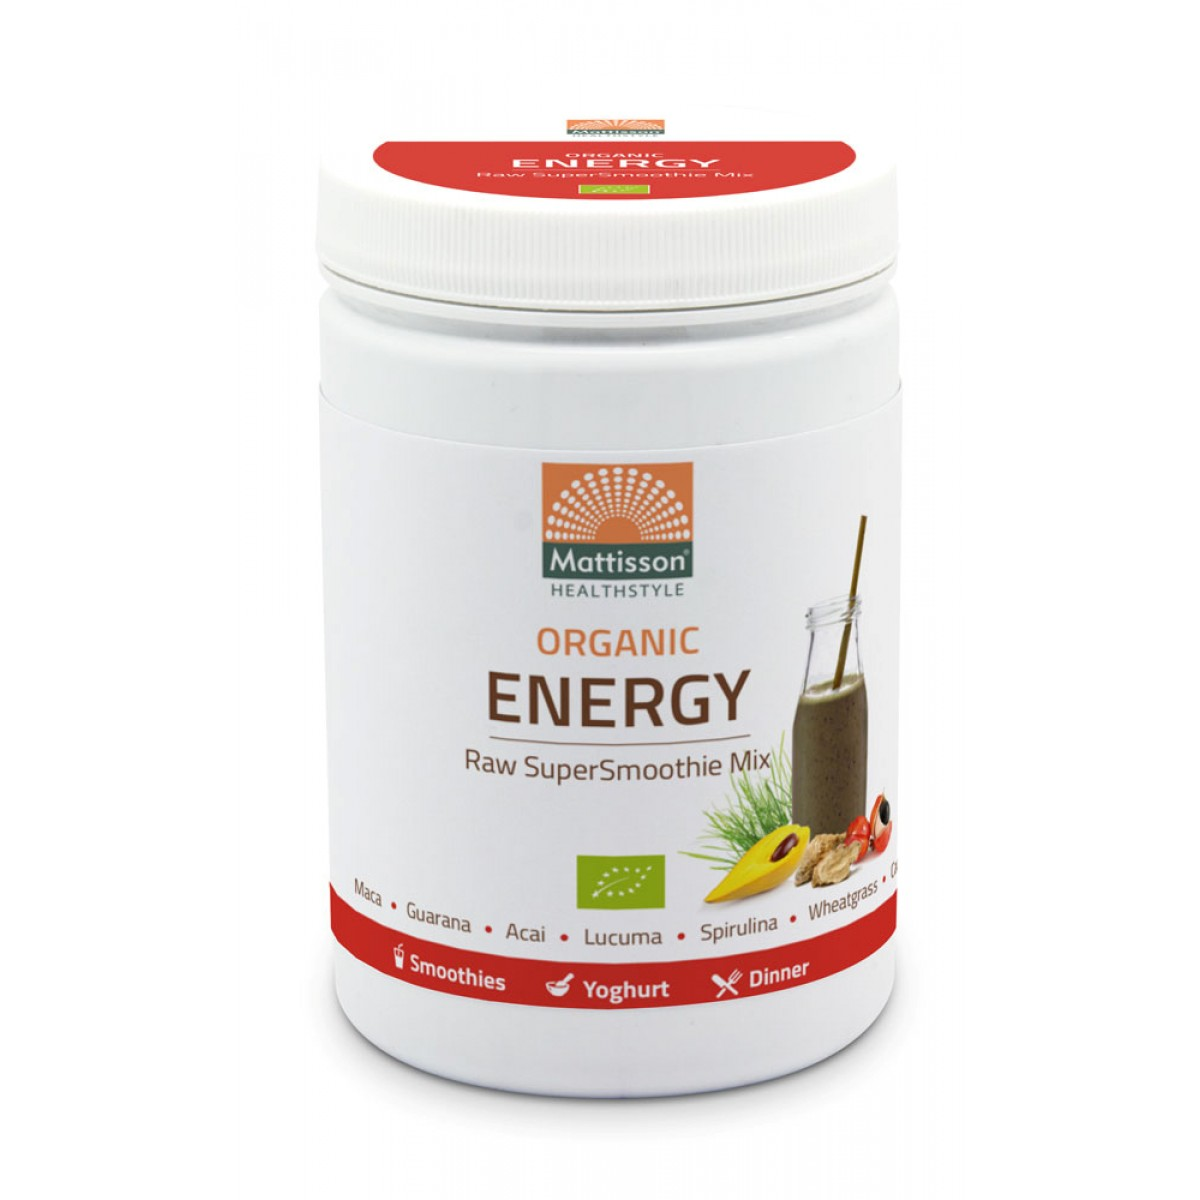 Super Smoothie Raw Energy Mix